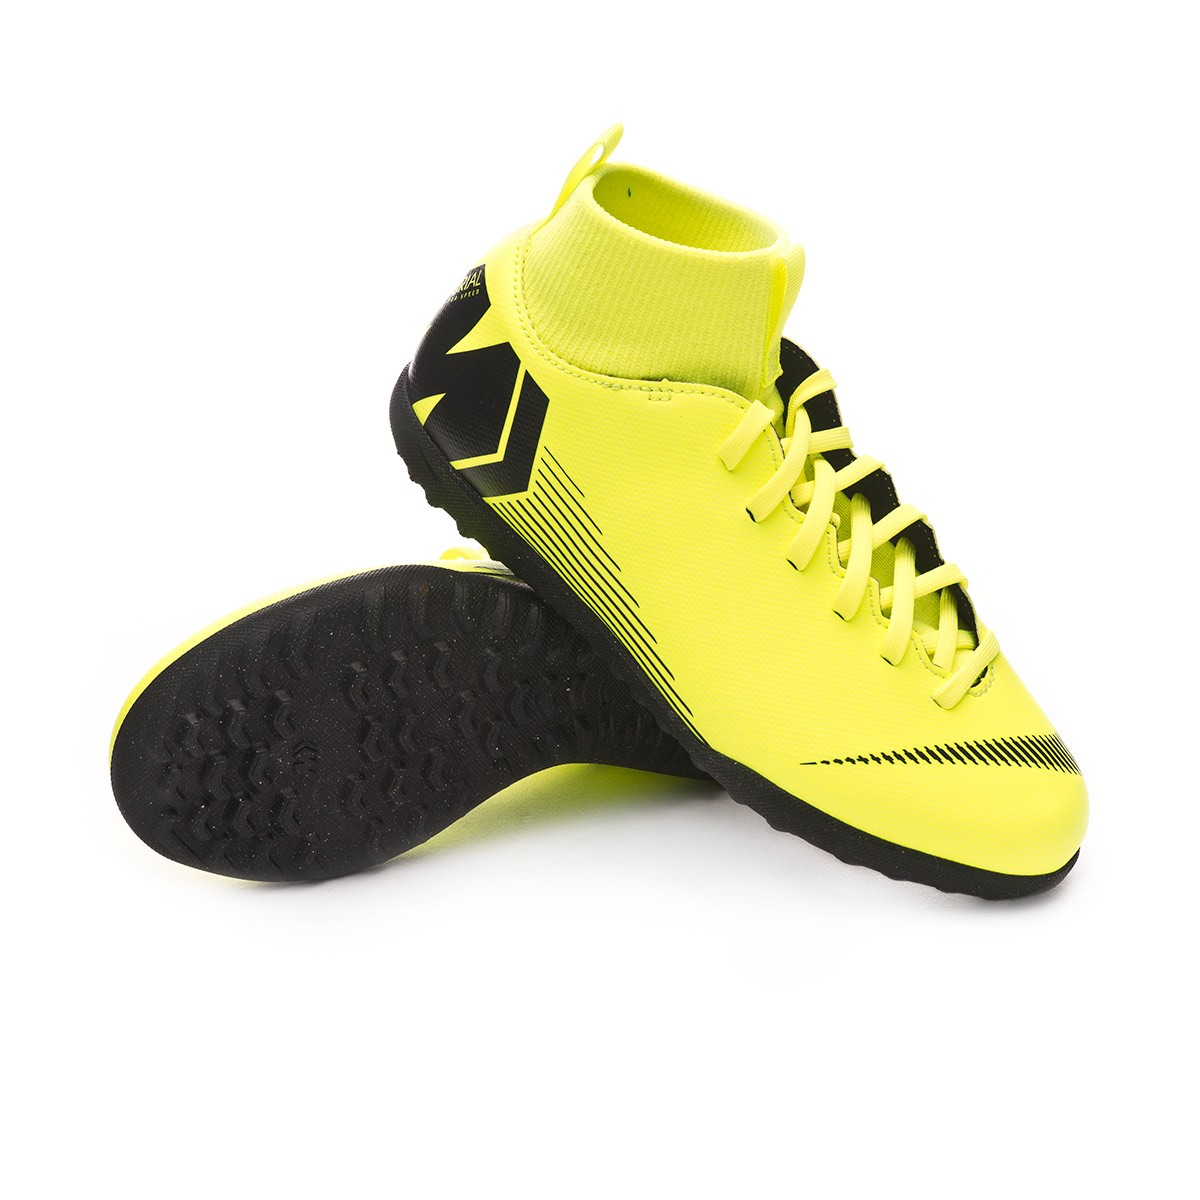 1d3ce79e441 Sapatilhas Nike Mercurial SuperflyX VI Club Turf Niño Volt-Black - Loja de  futebol Fútbol Emotion